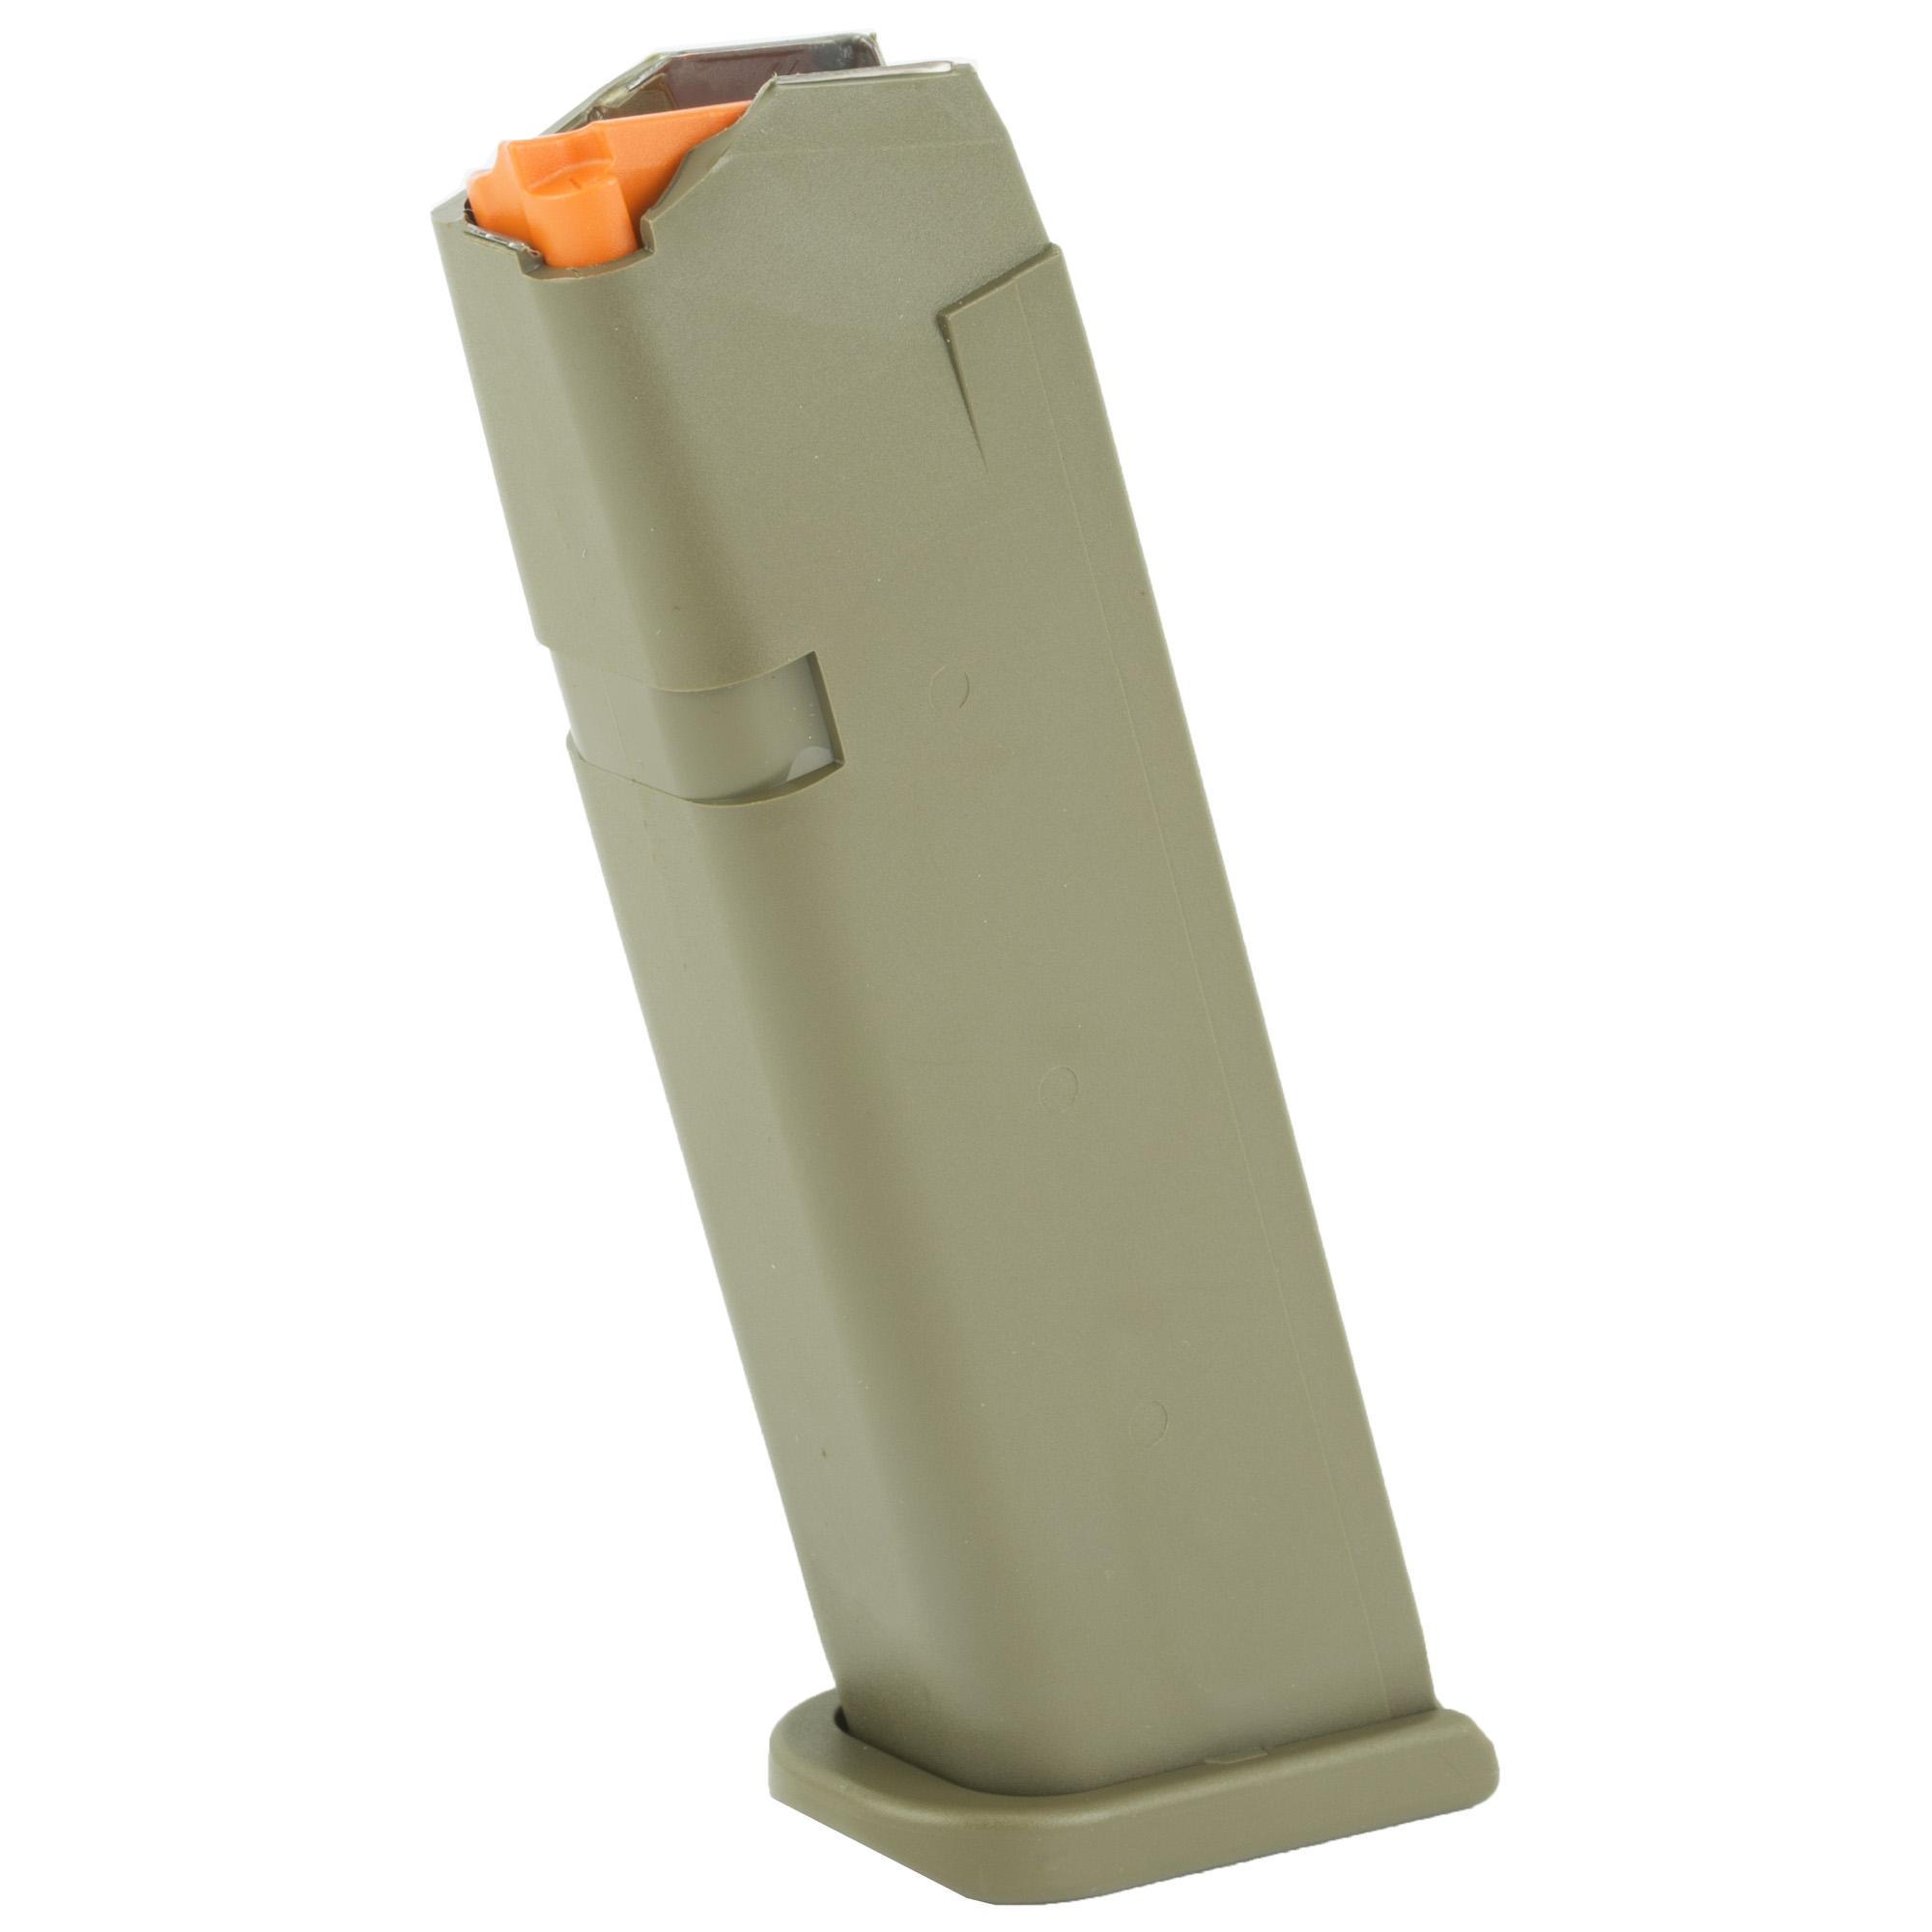 Glock 17 9mm 17RD Magazine - OD GREEN